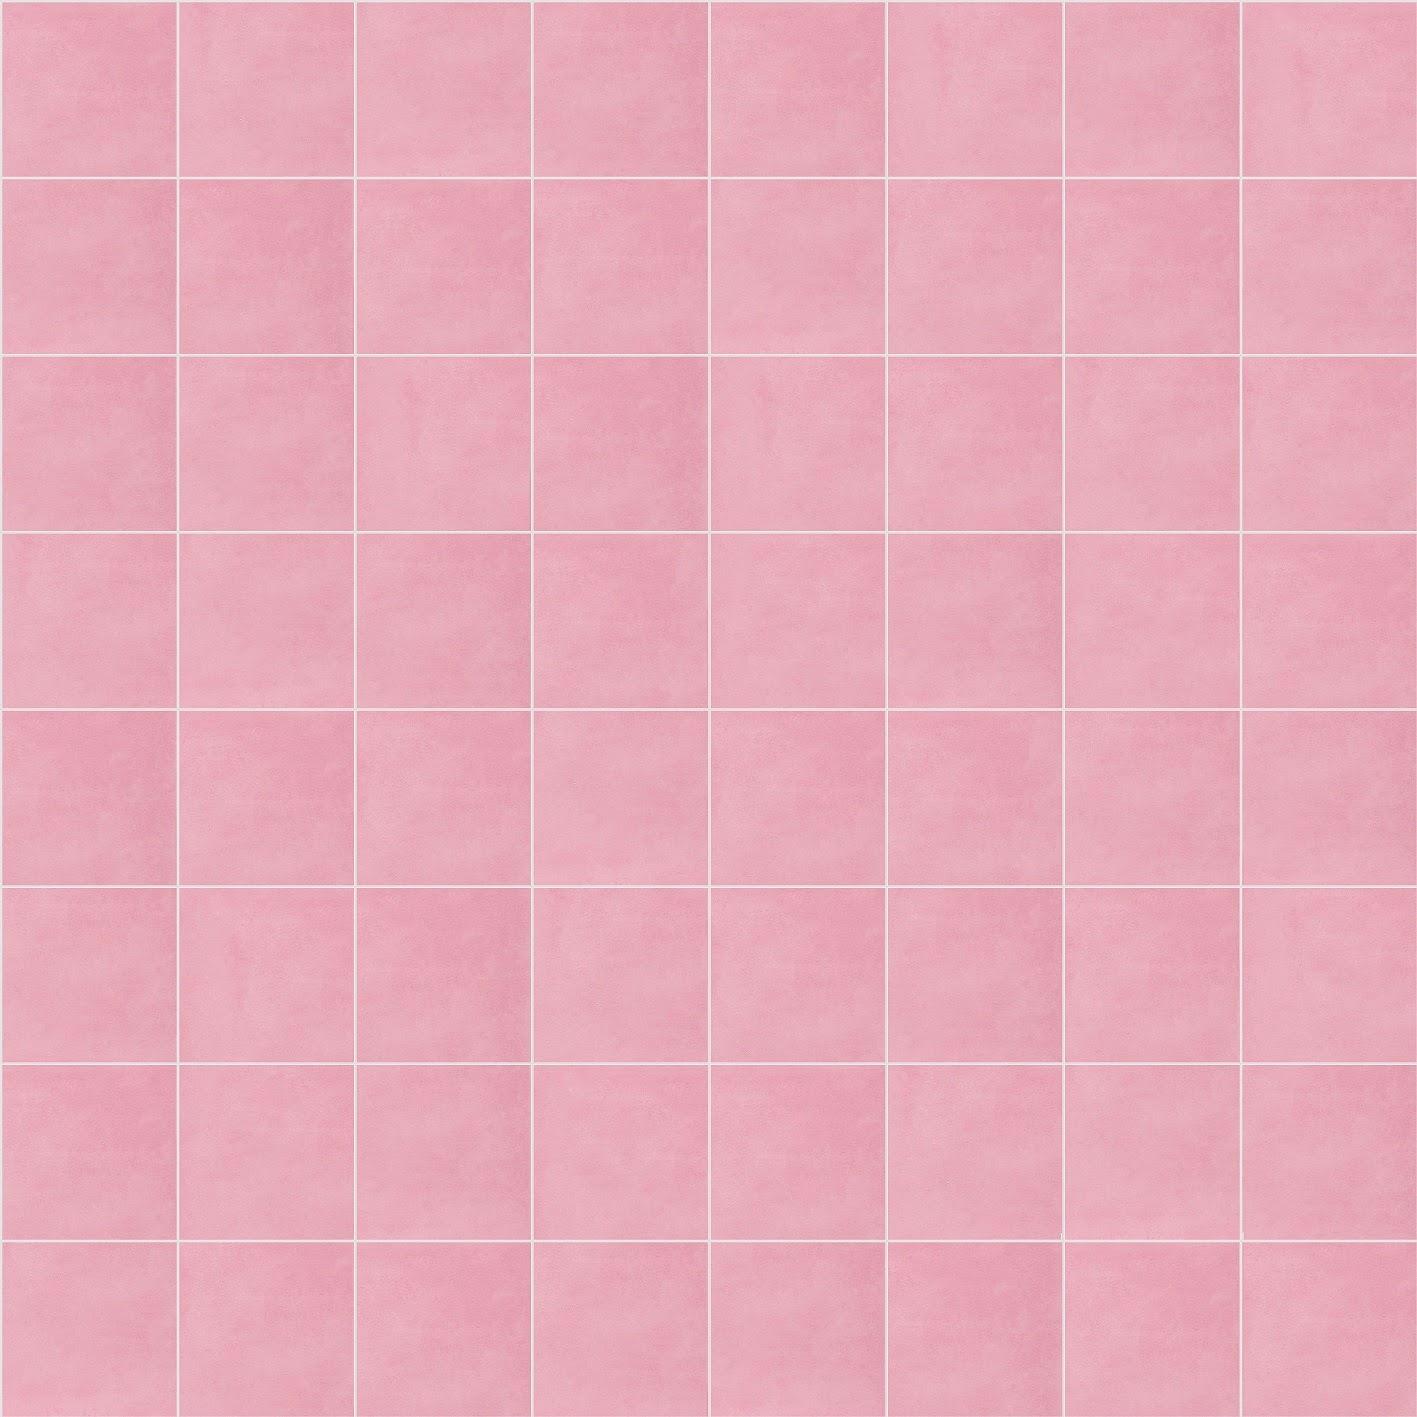 Piastrelle bagno texture simple apri with piastrelle bagno texture view images texture - Piastrelle bagno texture ...